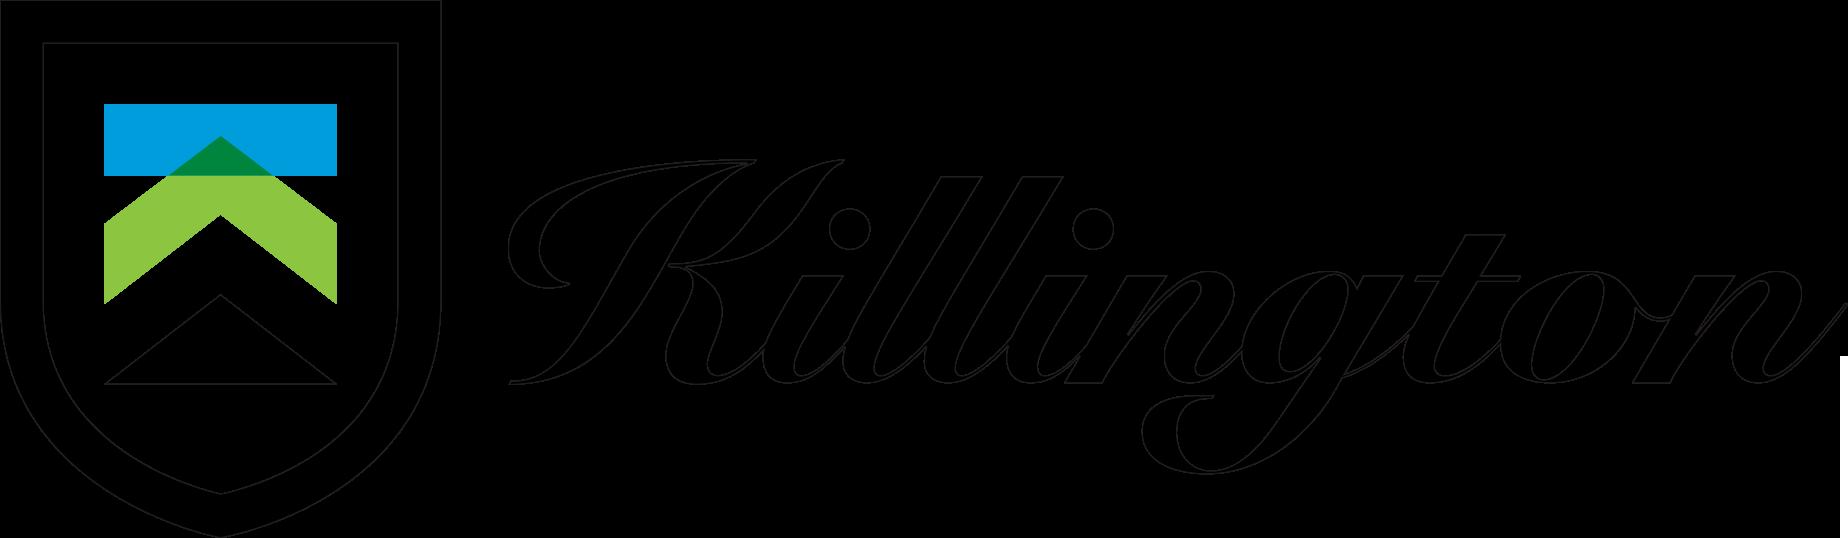 High Resolution killington logo.png